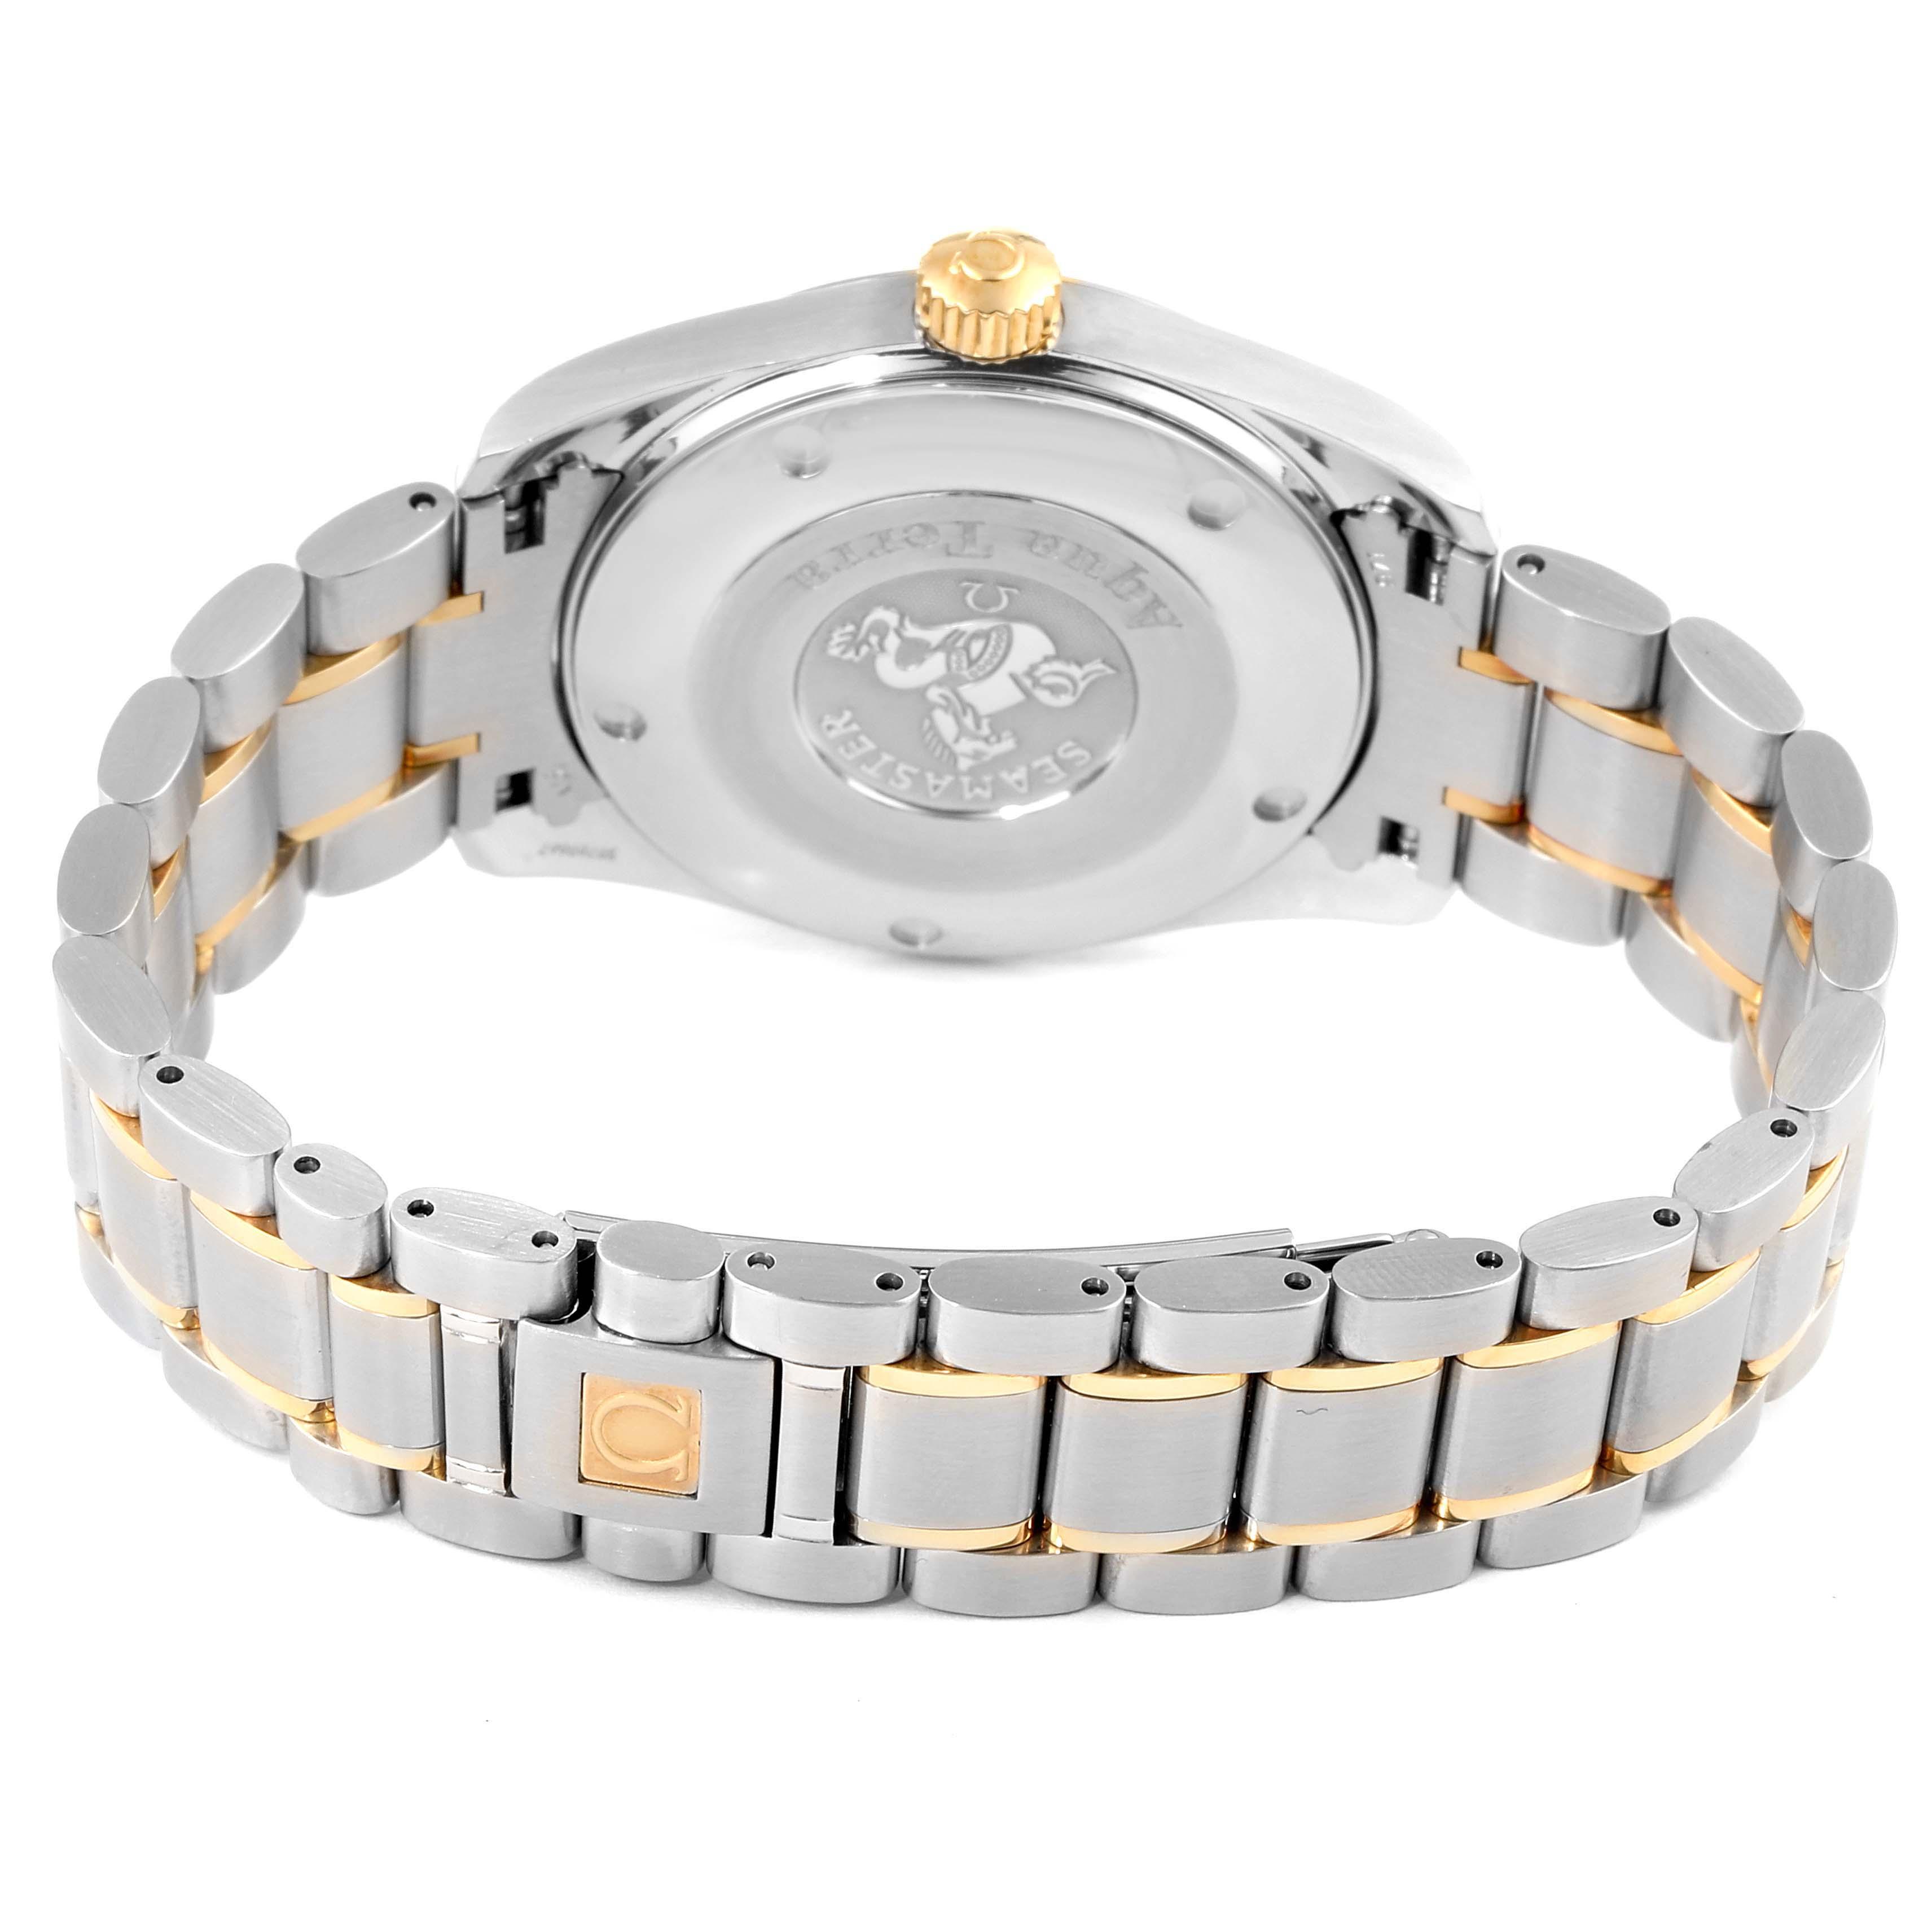 Omega Seamaster Aqua Terra Midsize Steel Yellow Gold Watch 2318.30.00 SwissWatchExpo